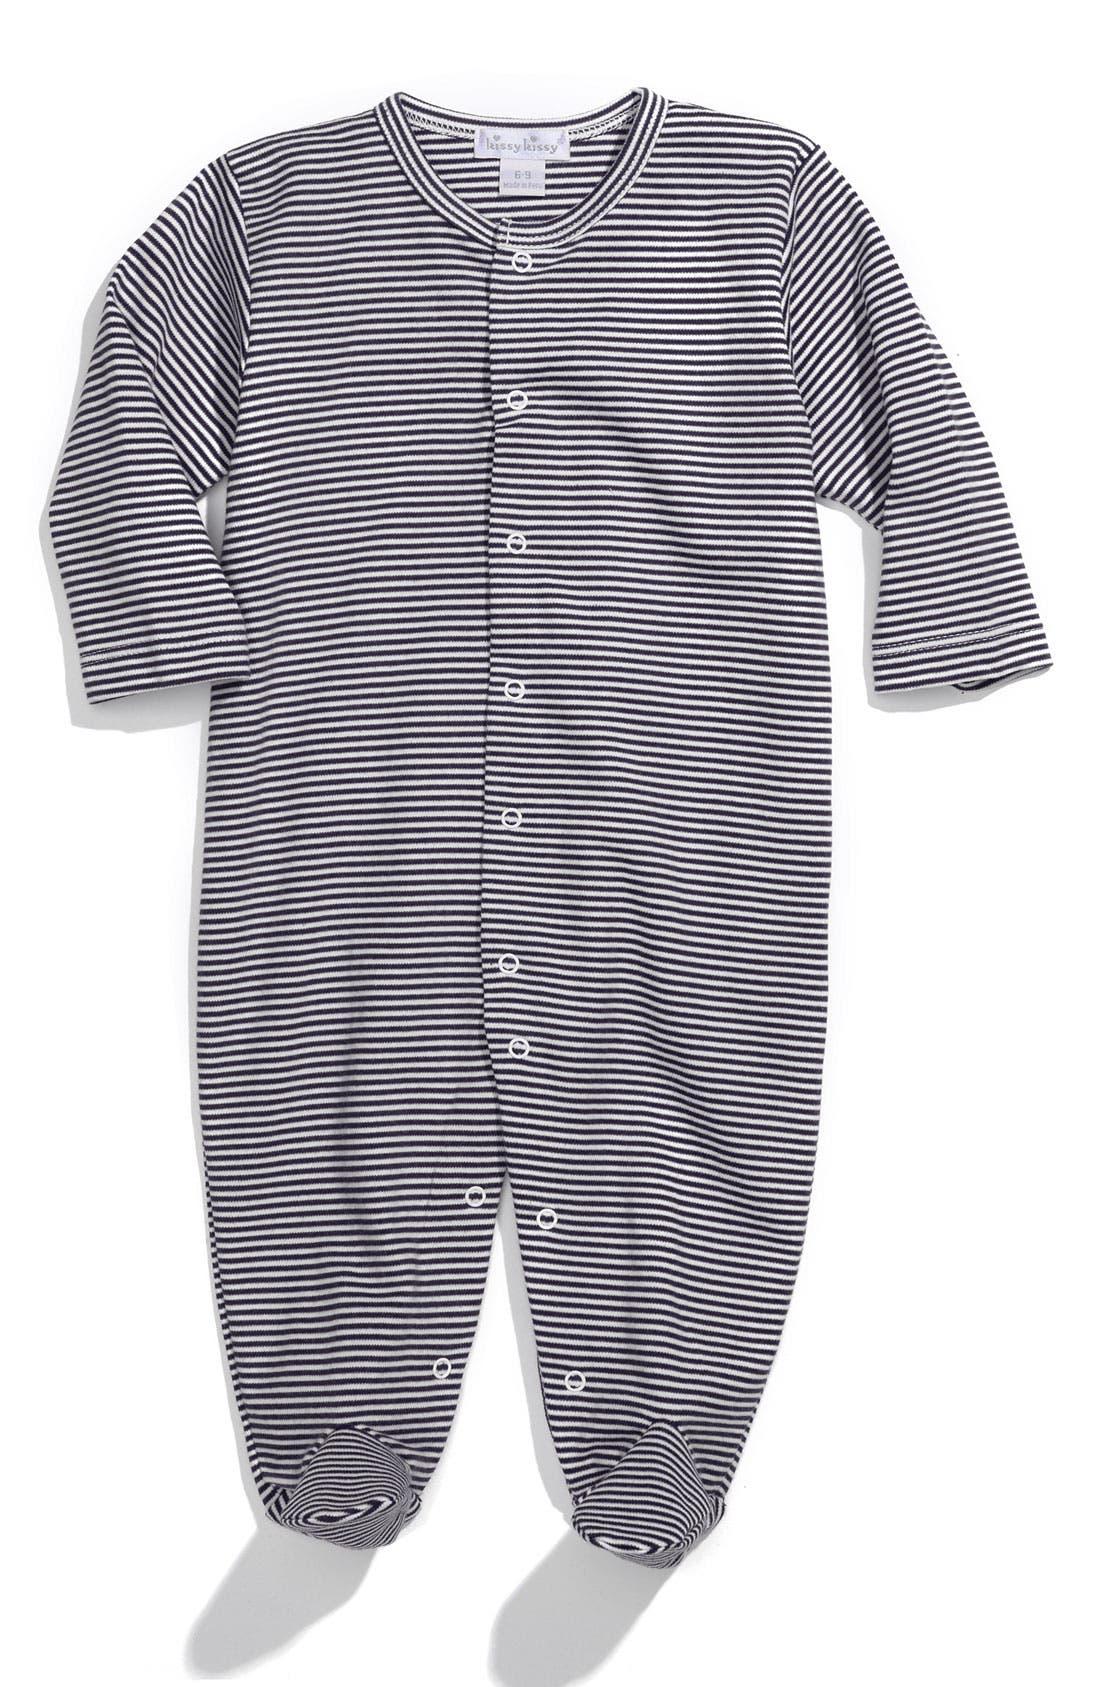 Main Image - Kissy Kissy Stripe Footie (Infant)